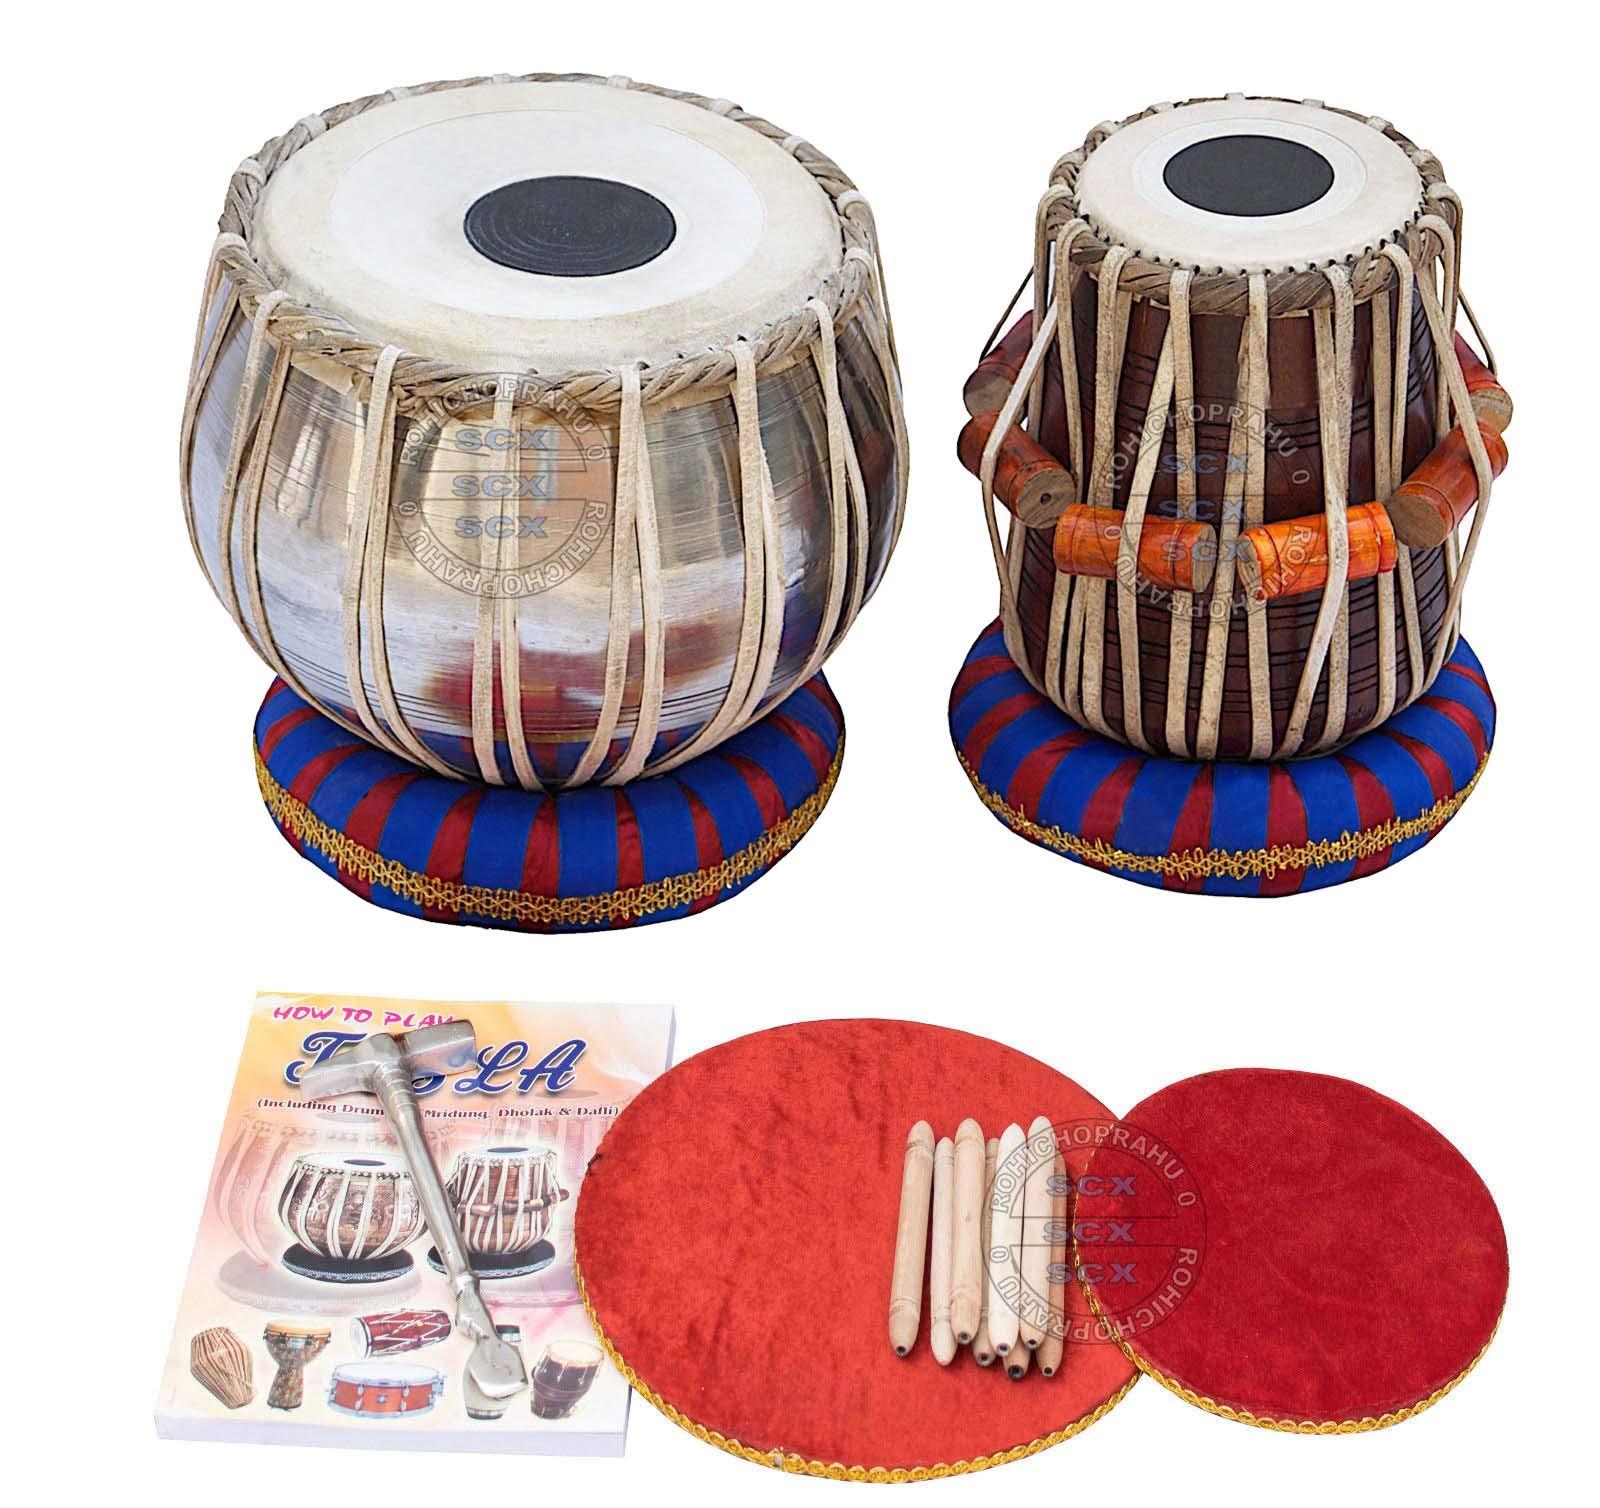 Tabla Set, Shreyas Designer Silver Bayan, Sheesham Tabla Dayan, Professional Drums, Padded Bag, Book, Hammer, Cushions, Cover, Tabla Drums Indian by SHREYAS